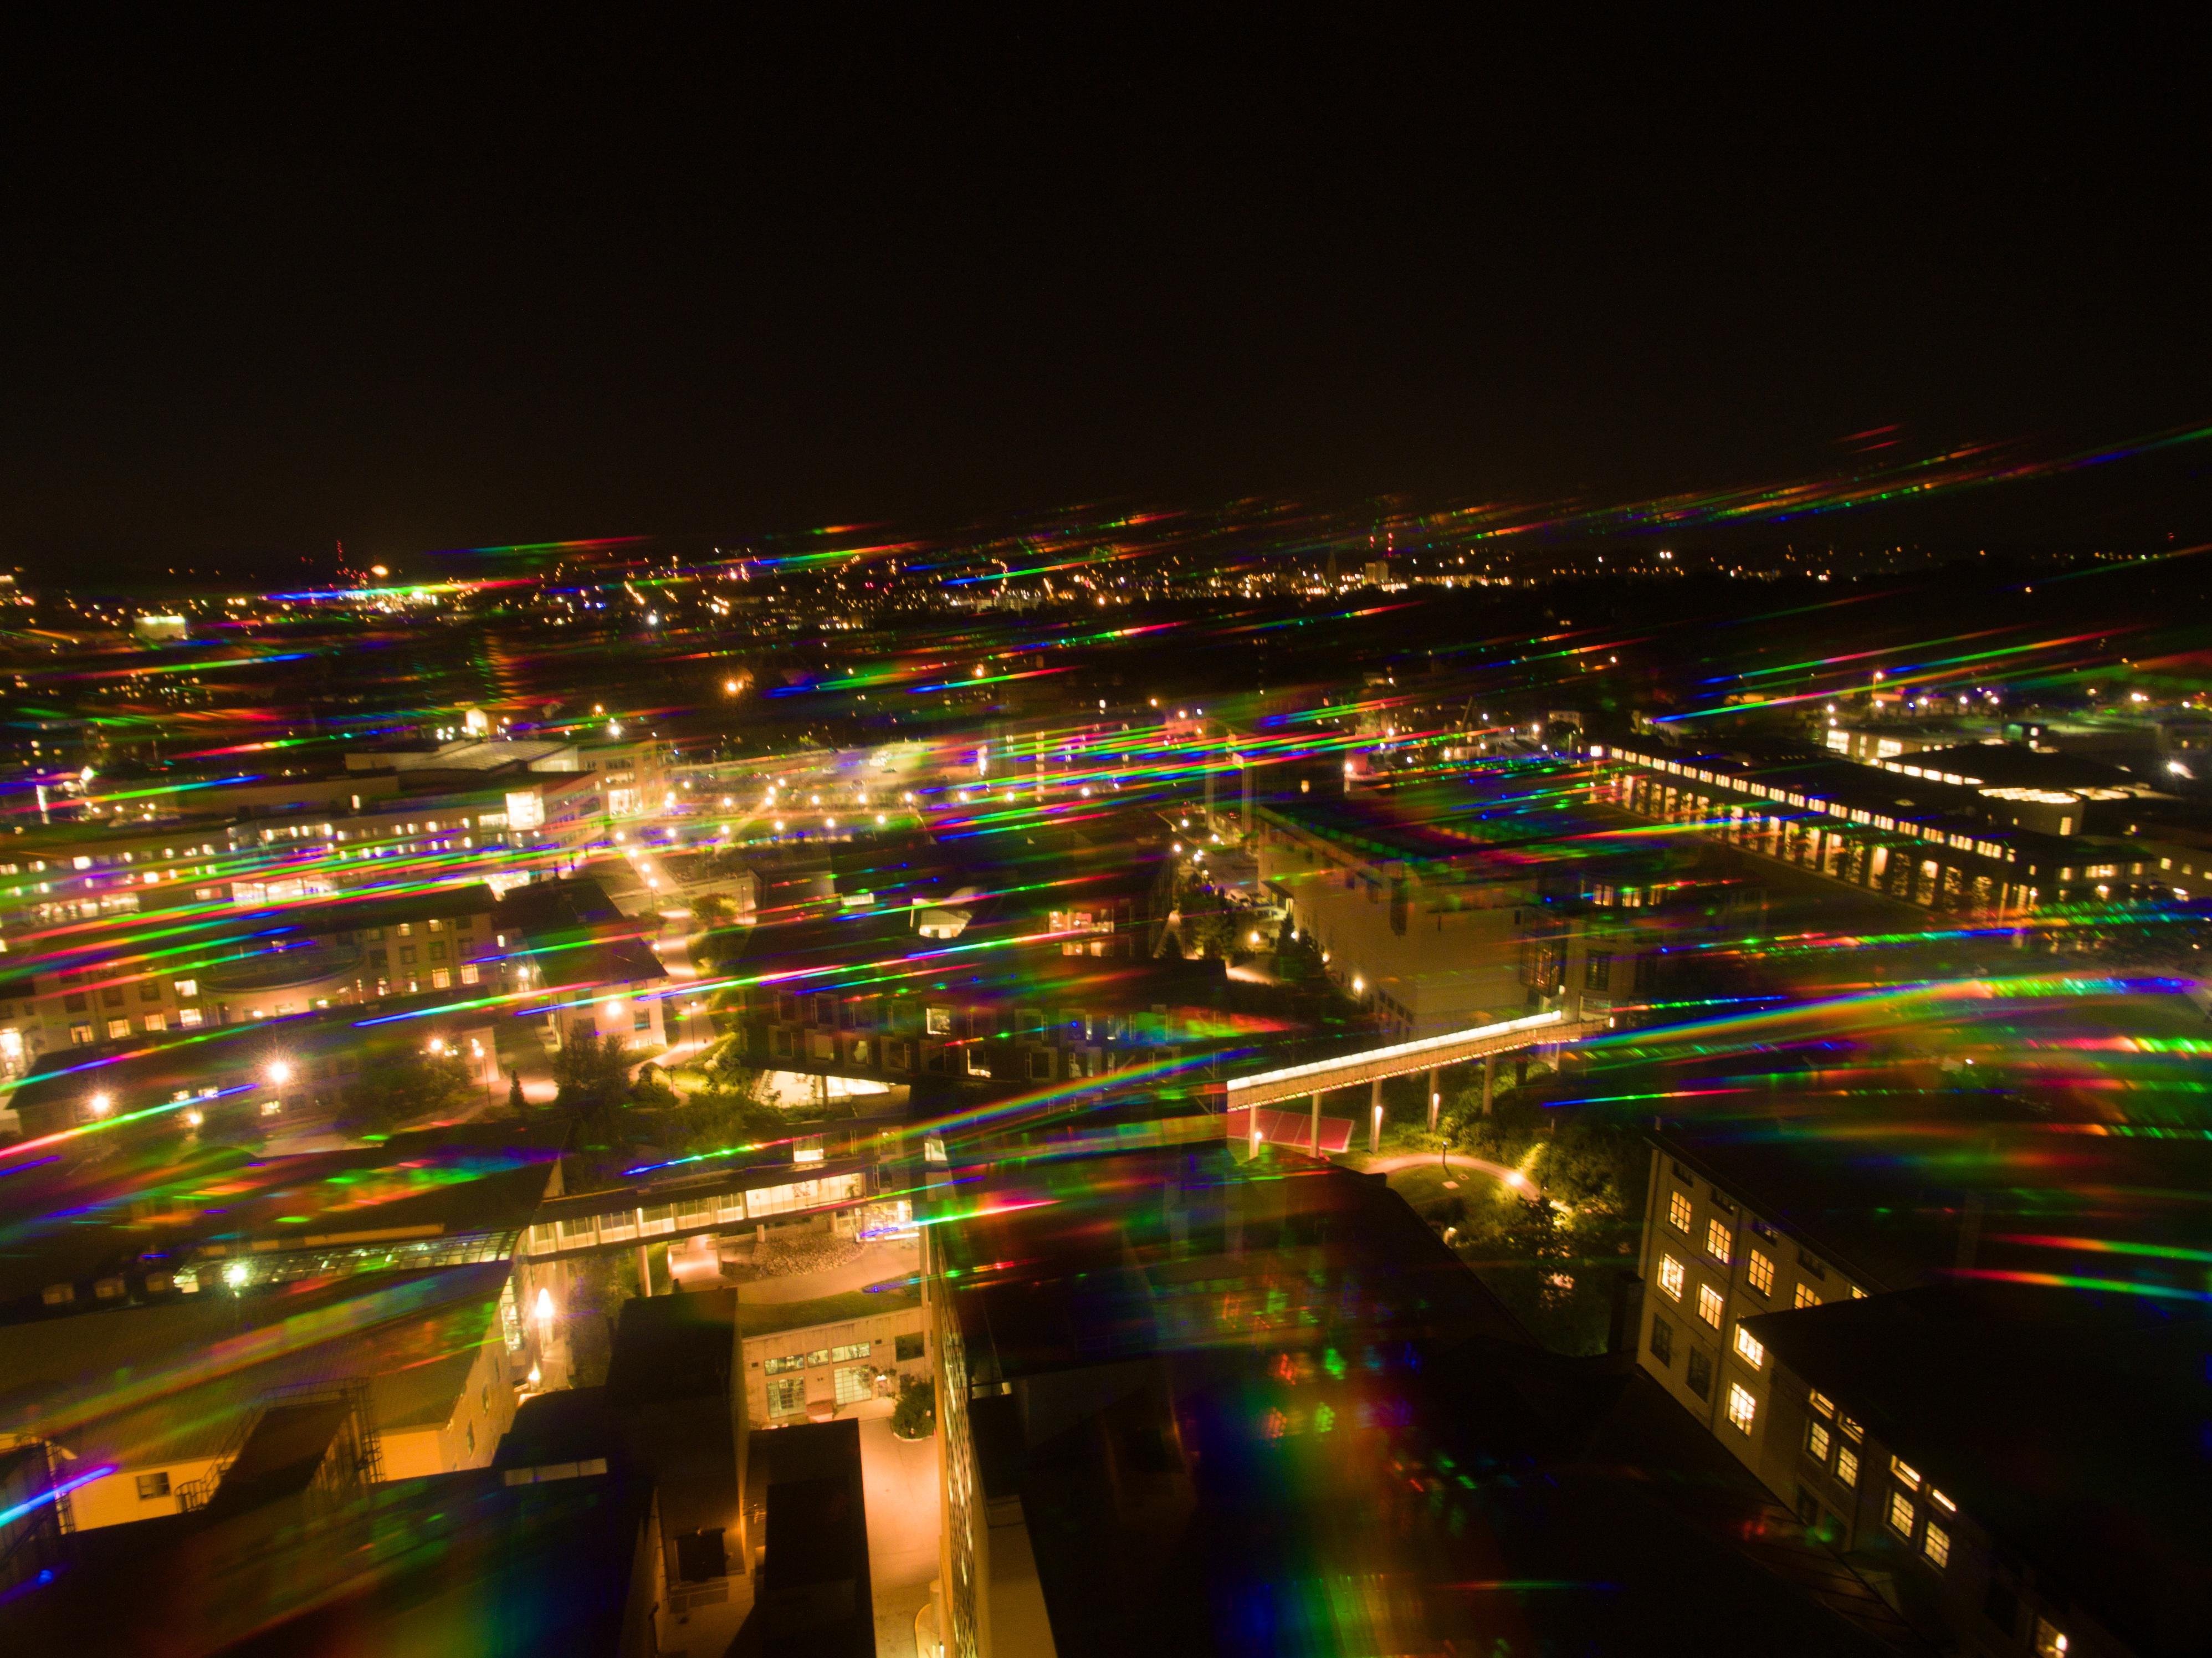 Cmu_light_pollution_monitoring-16